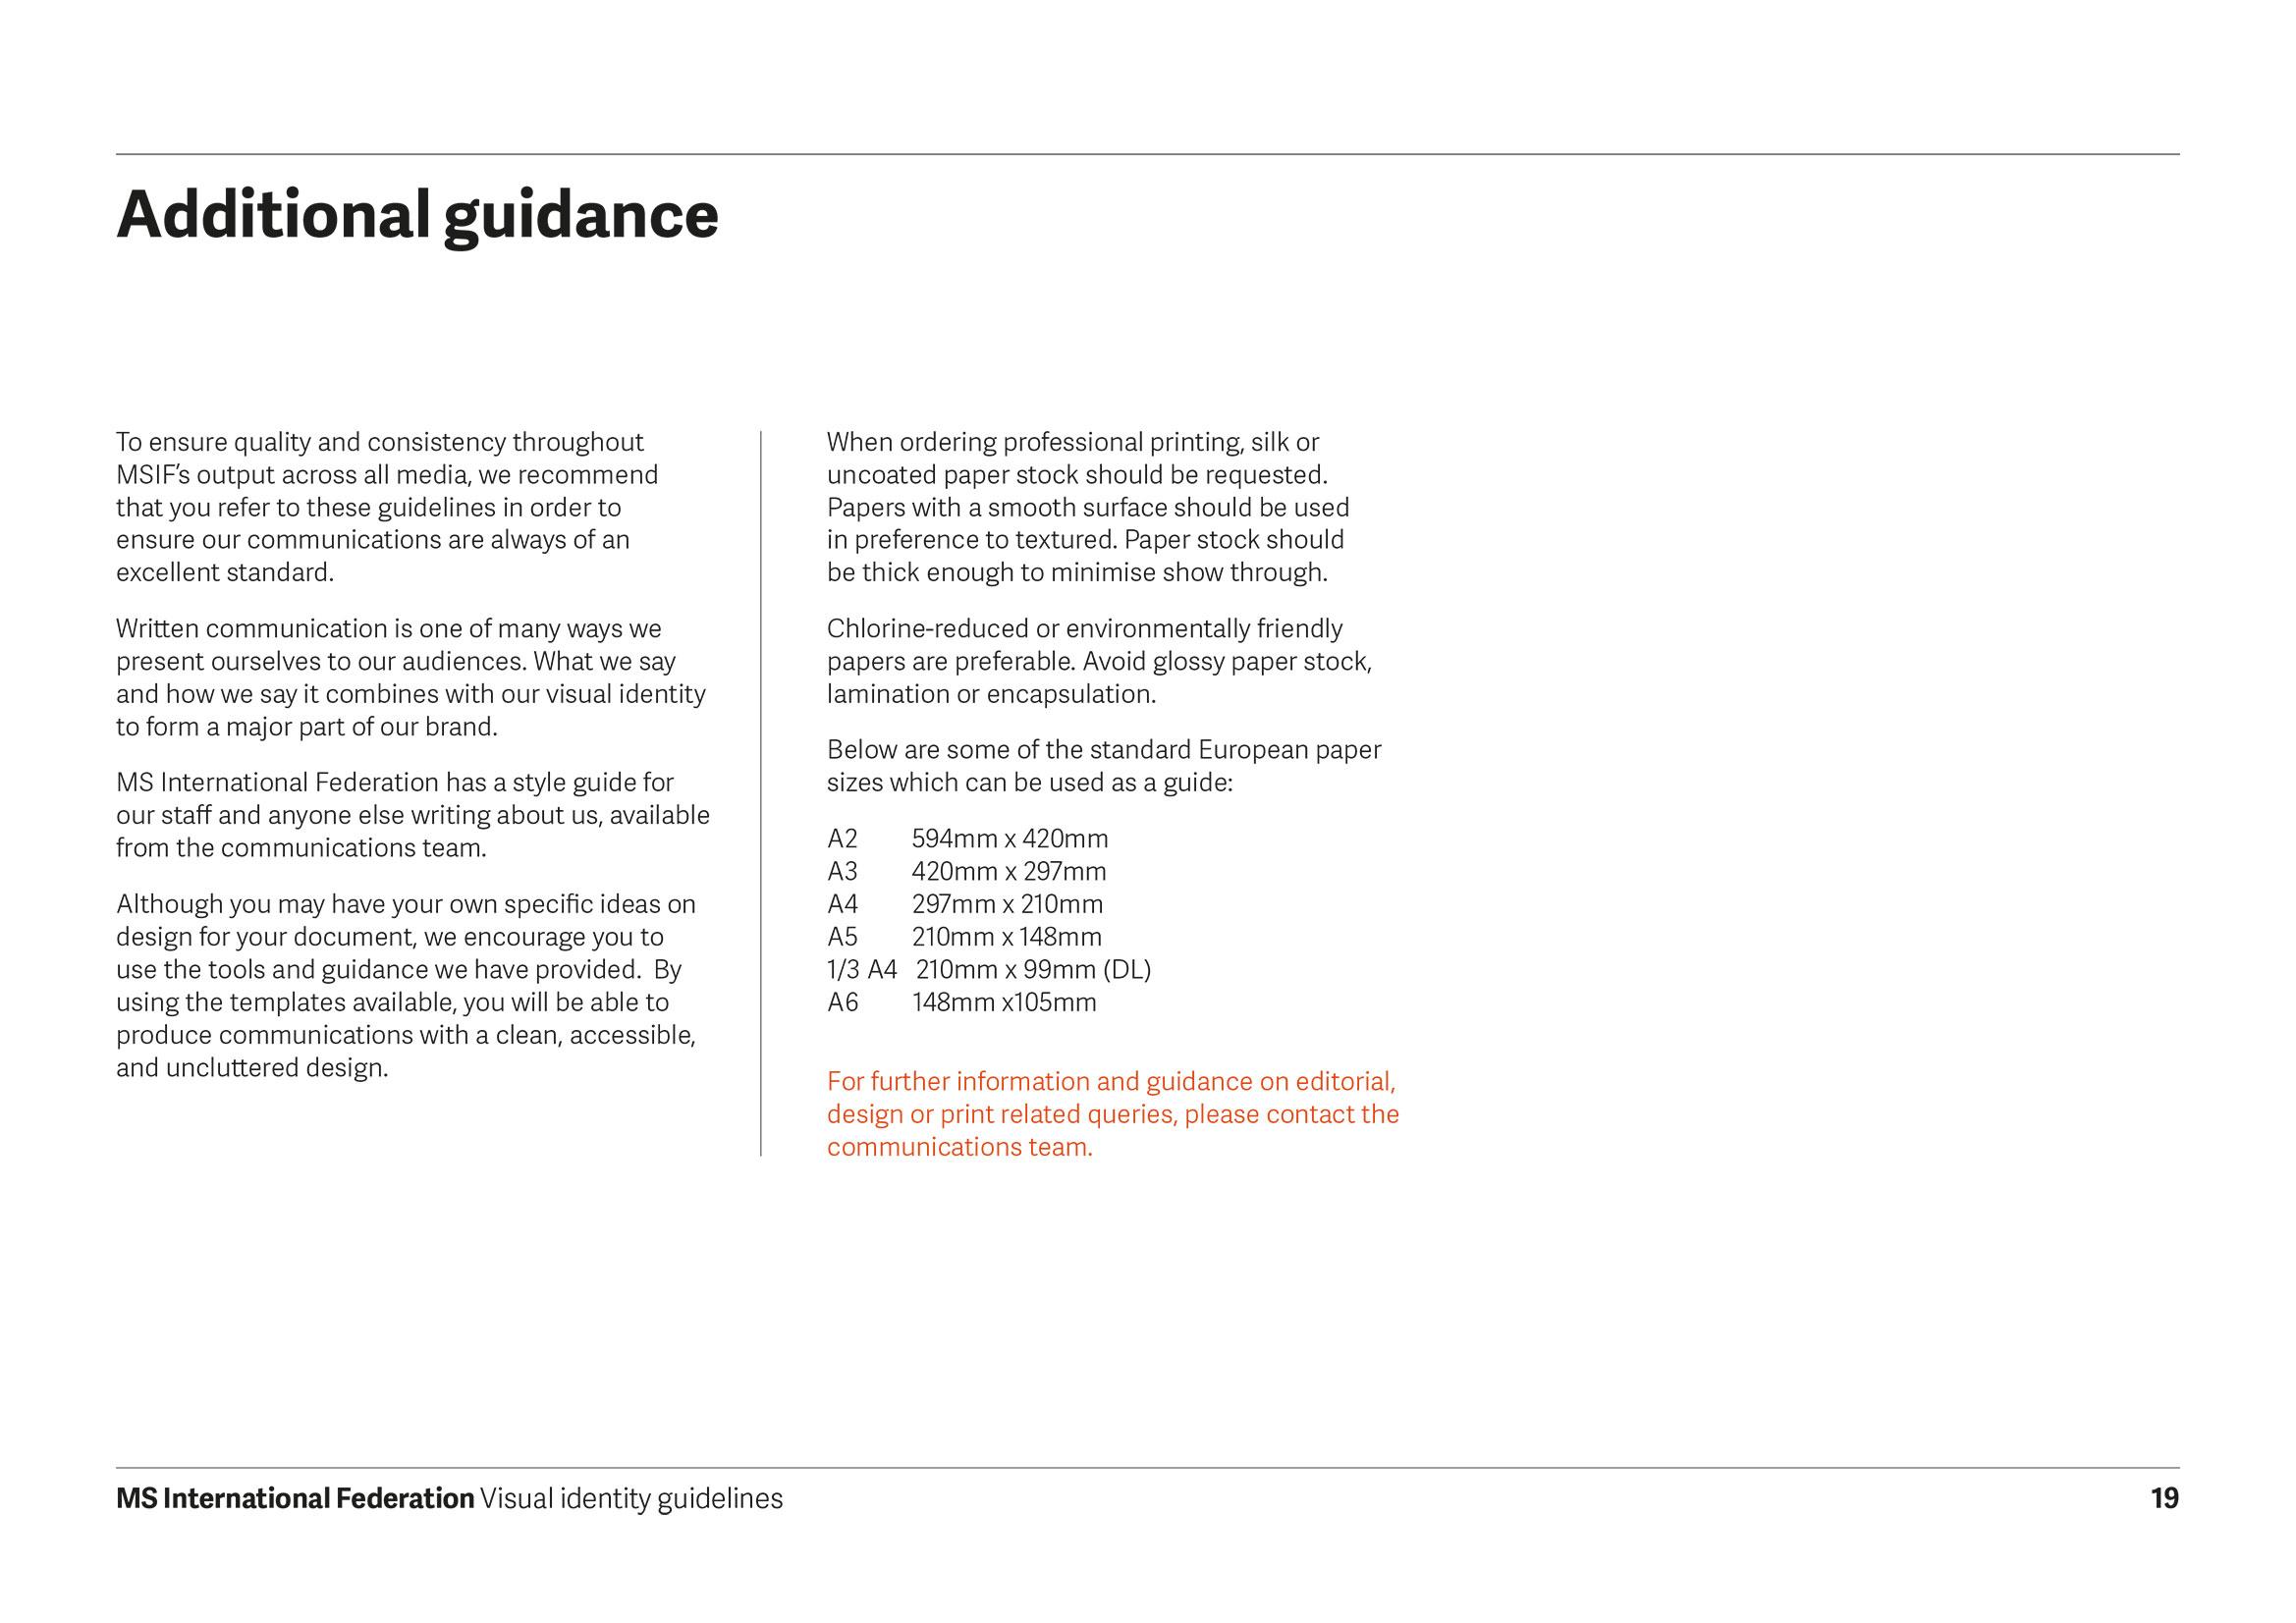 MSIF-VISUAL-IDENTITY-GUIDELINES-19.jpg